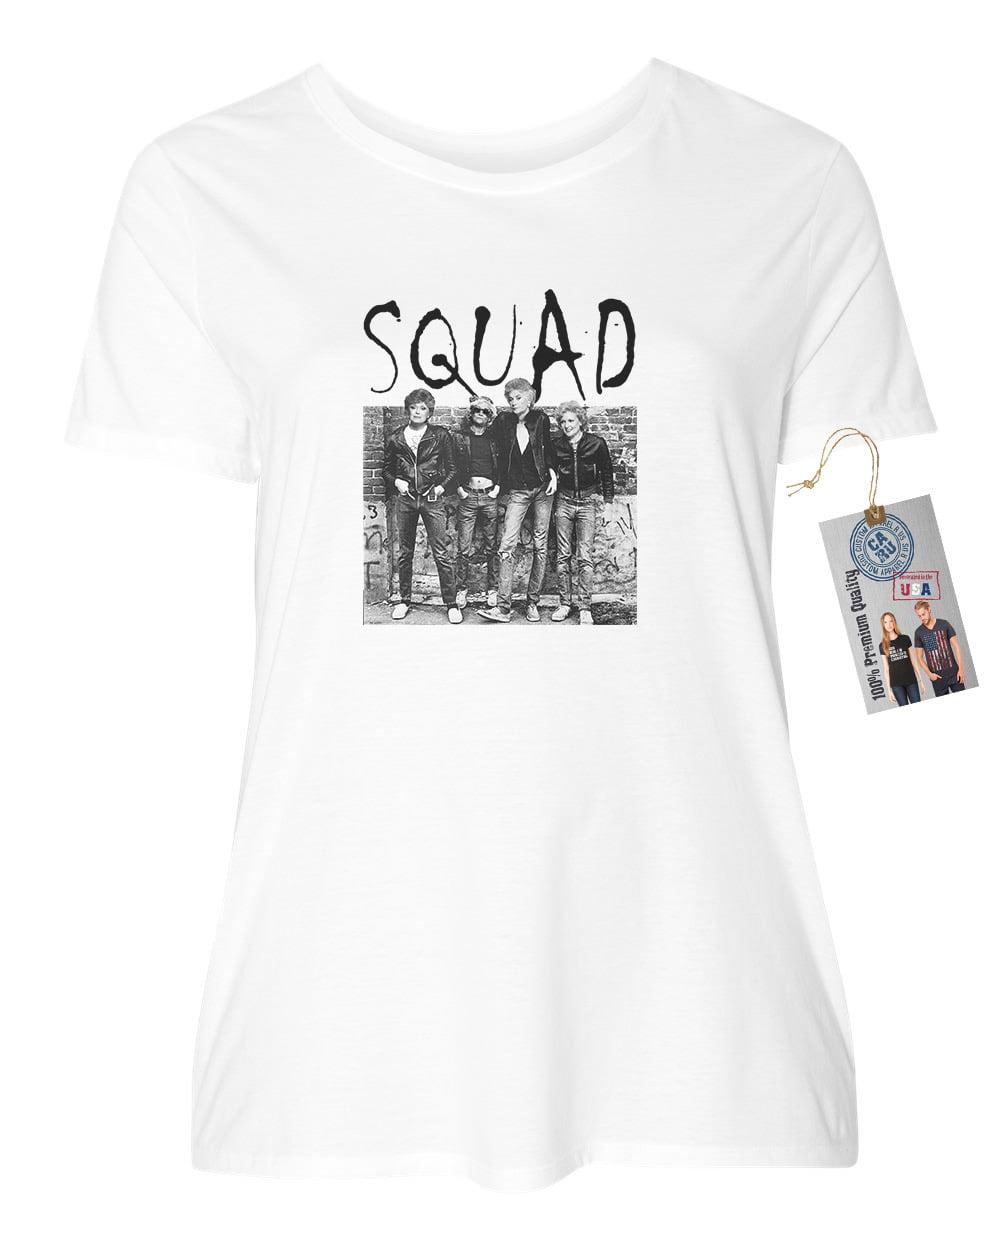 Golden Girls Squad Gang TV Show Plus Size Womens Short Sleeve Shirt